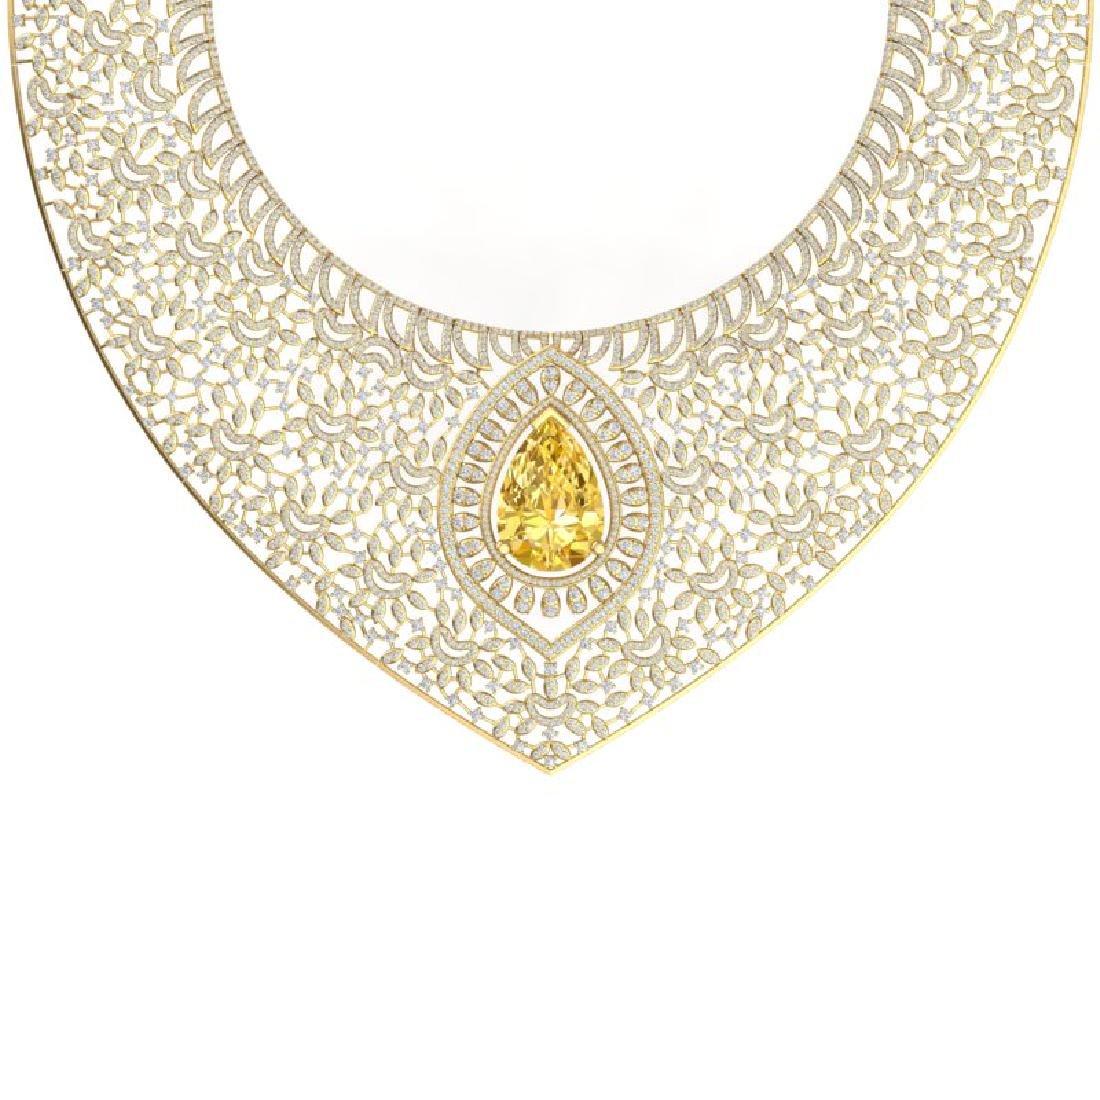 59.27 CTW Royalty Canary Citrine & VS Diamond Necklace - 2